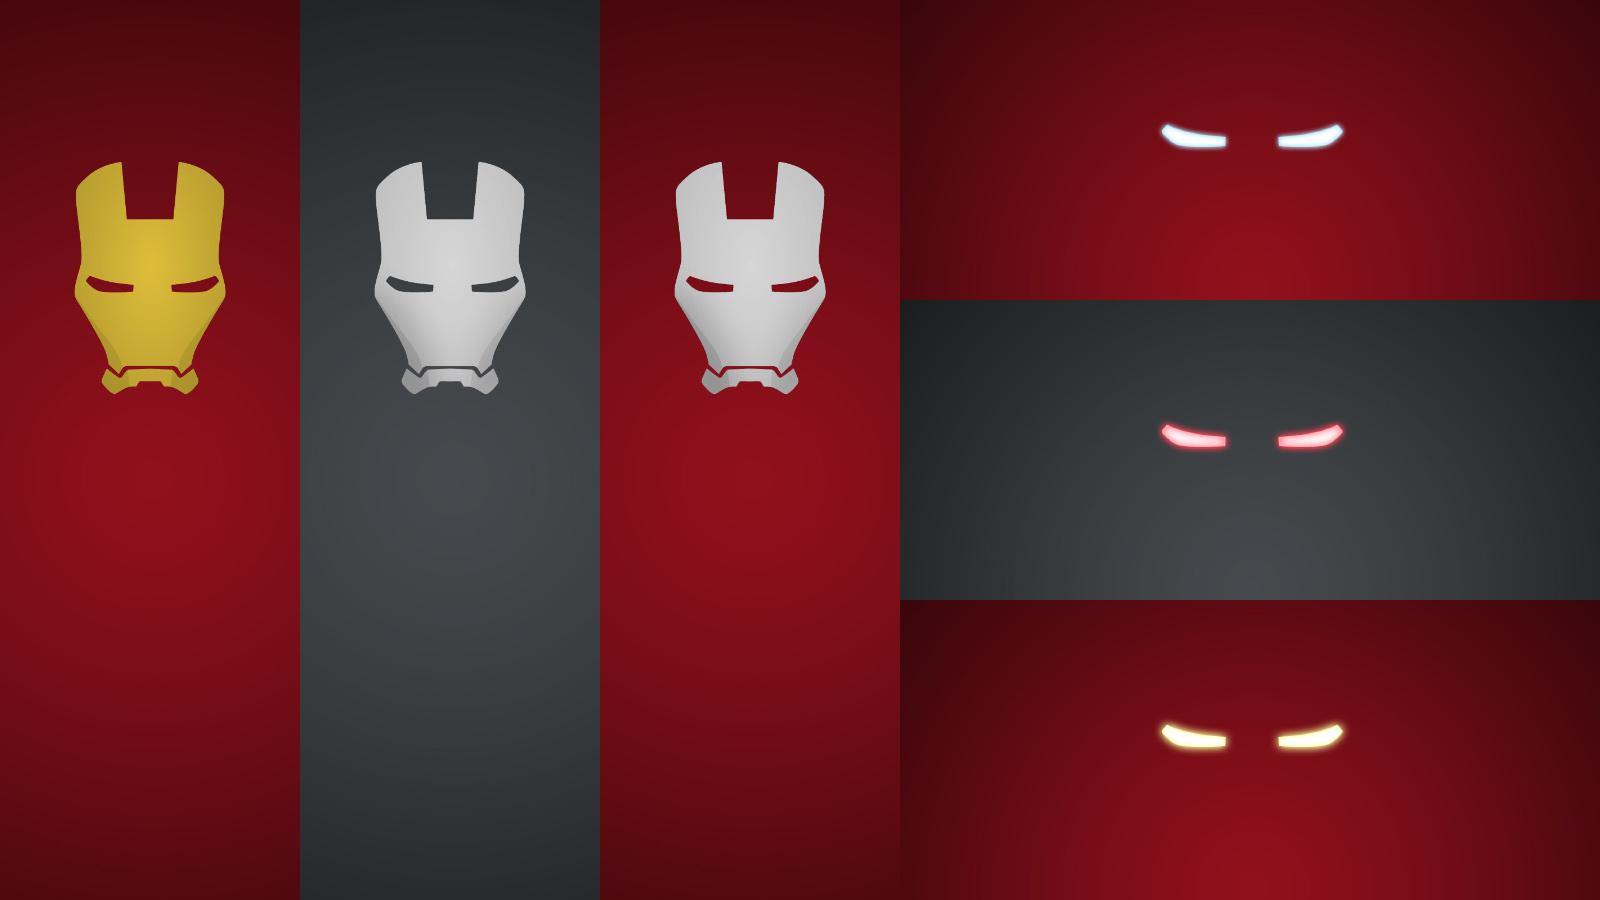 Minimalism iron man hd wallpaper free high definition for A minimalist